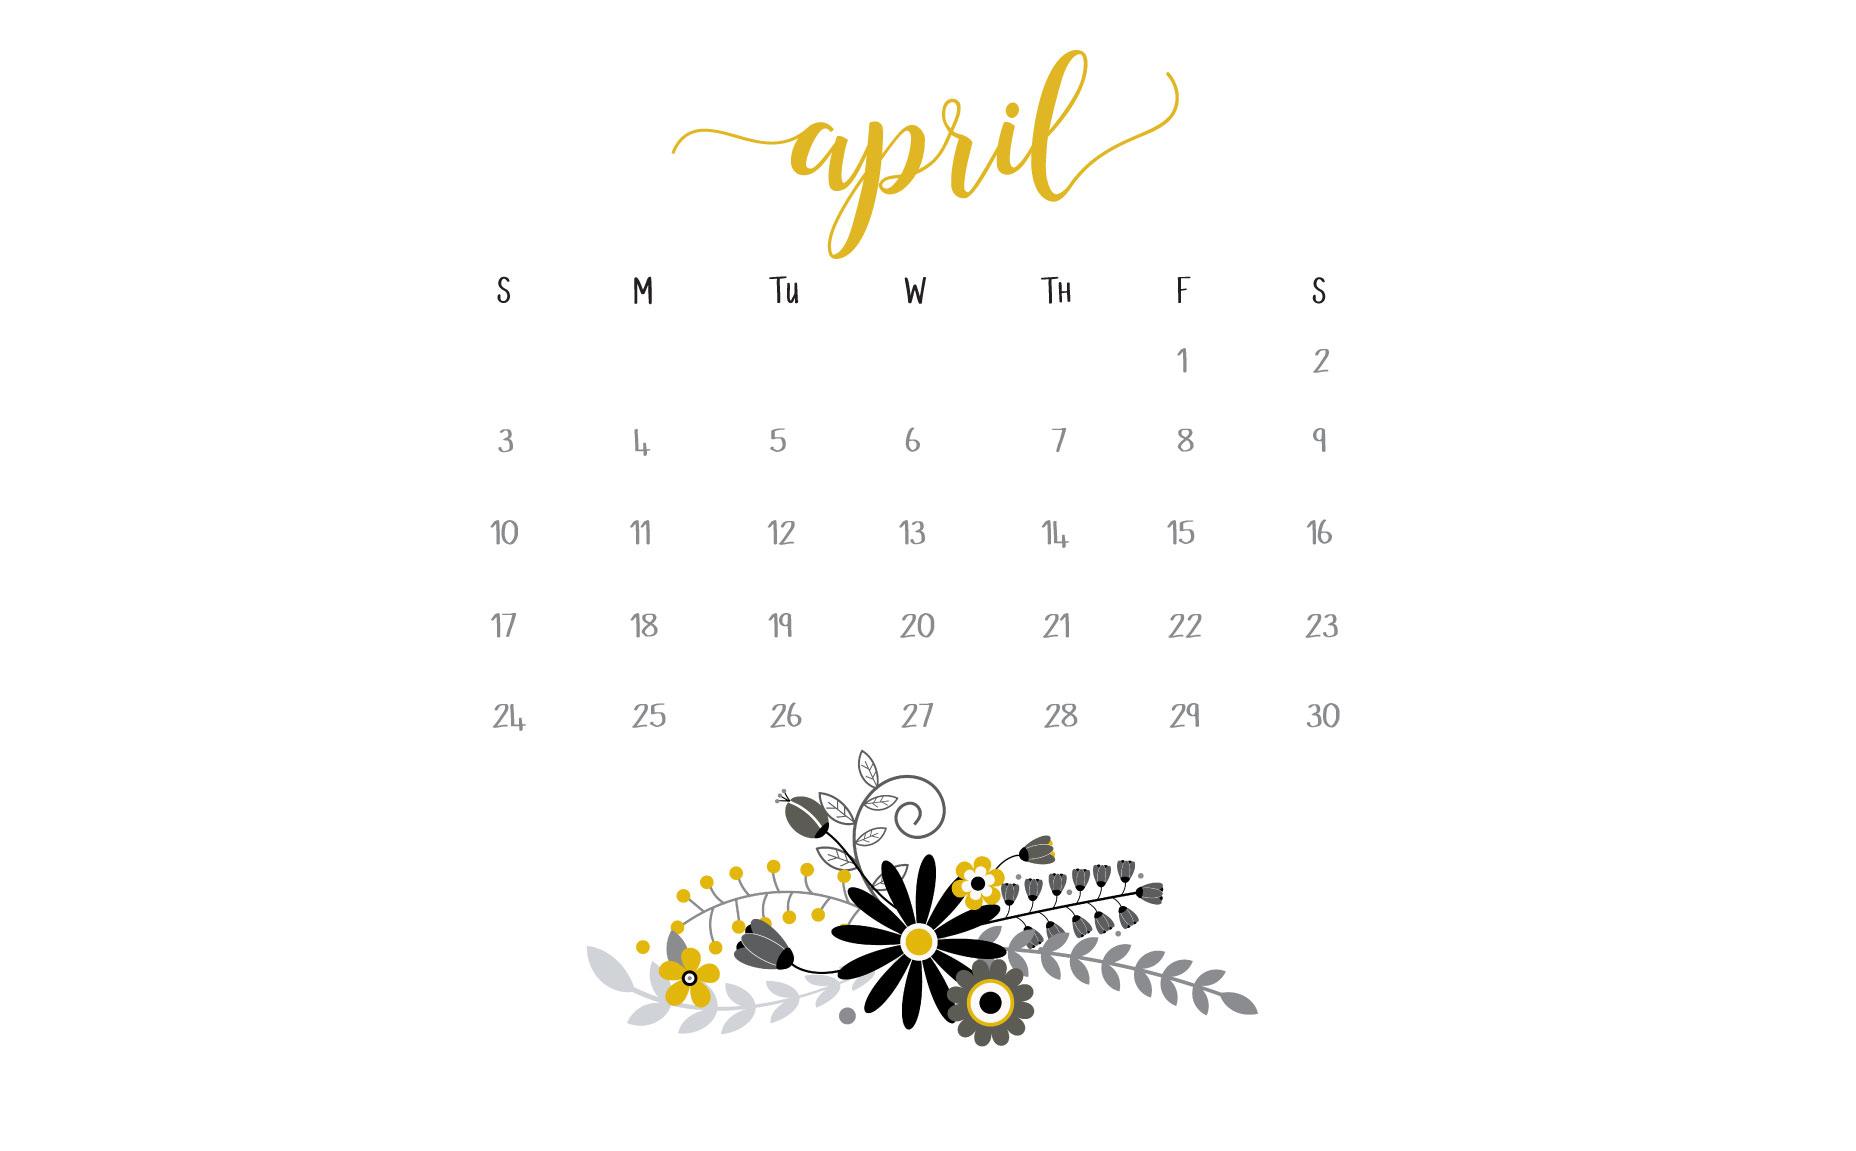 April 2016 Calendar Printables And Freebies regarding How To Make Google Calendar My Desktop Background